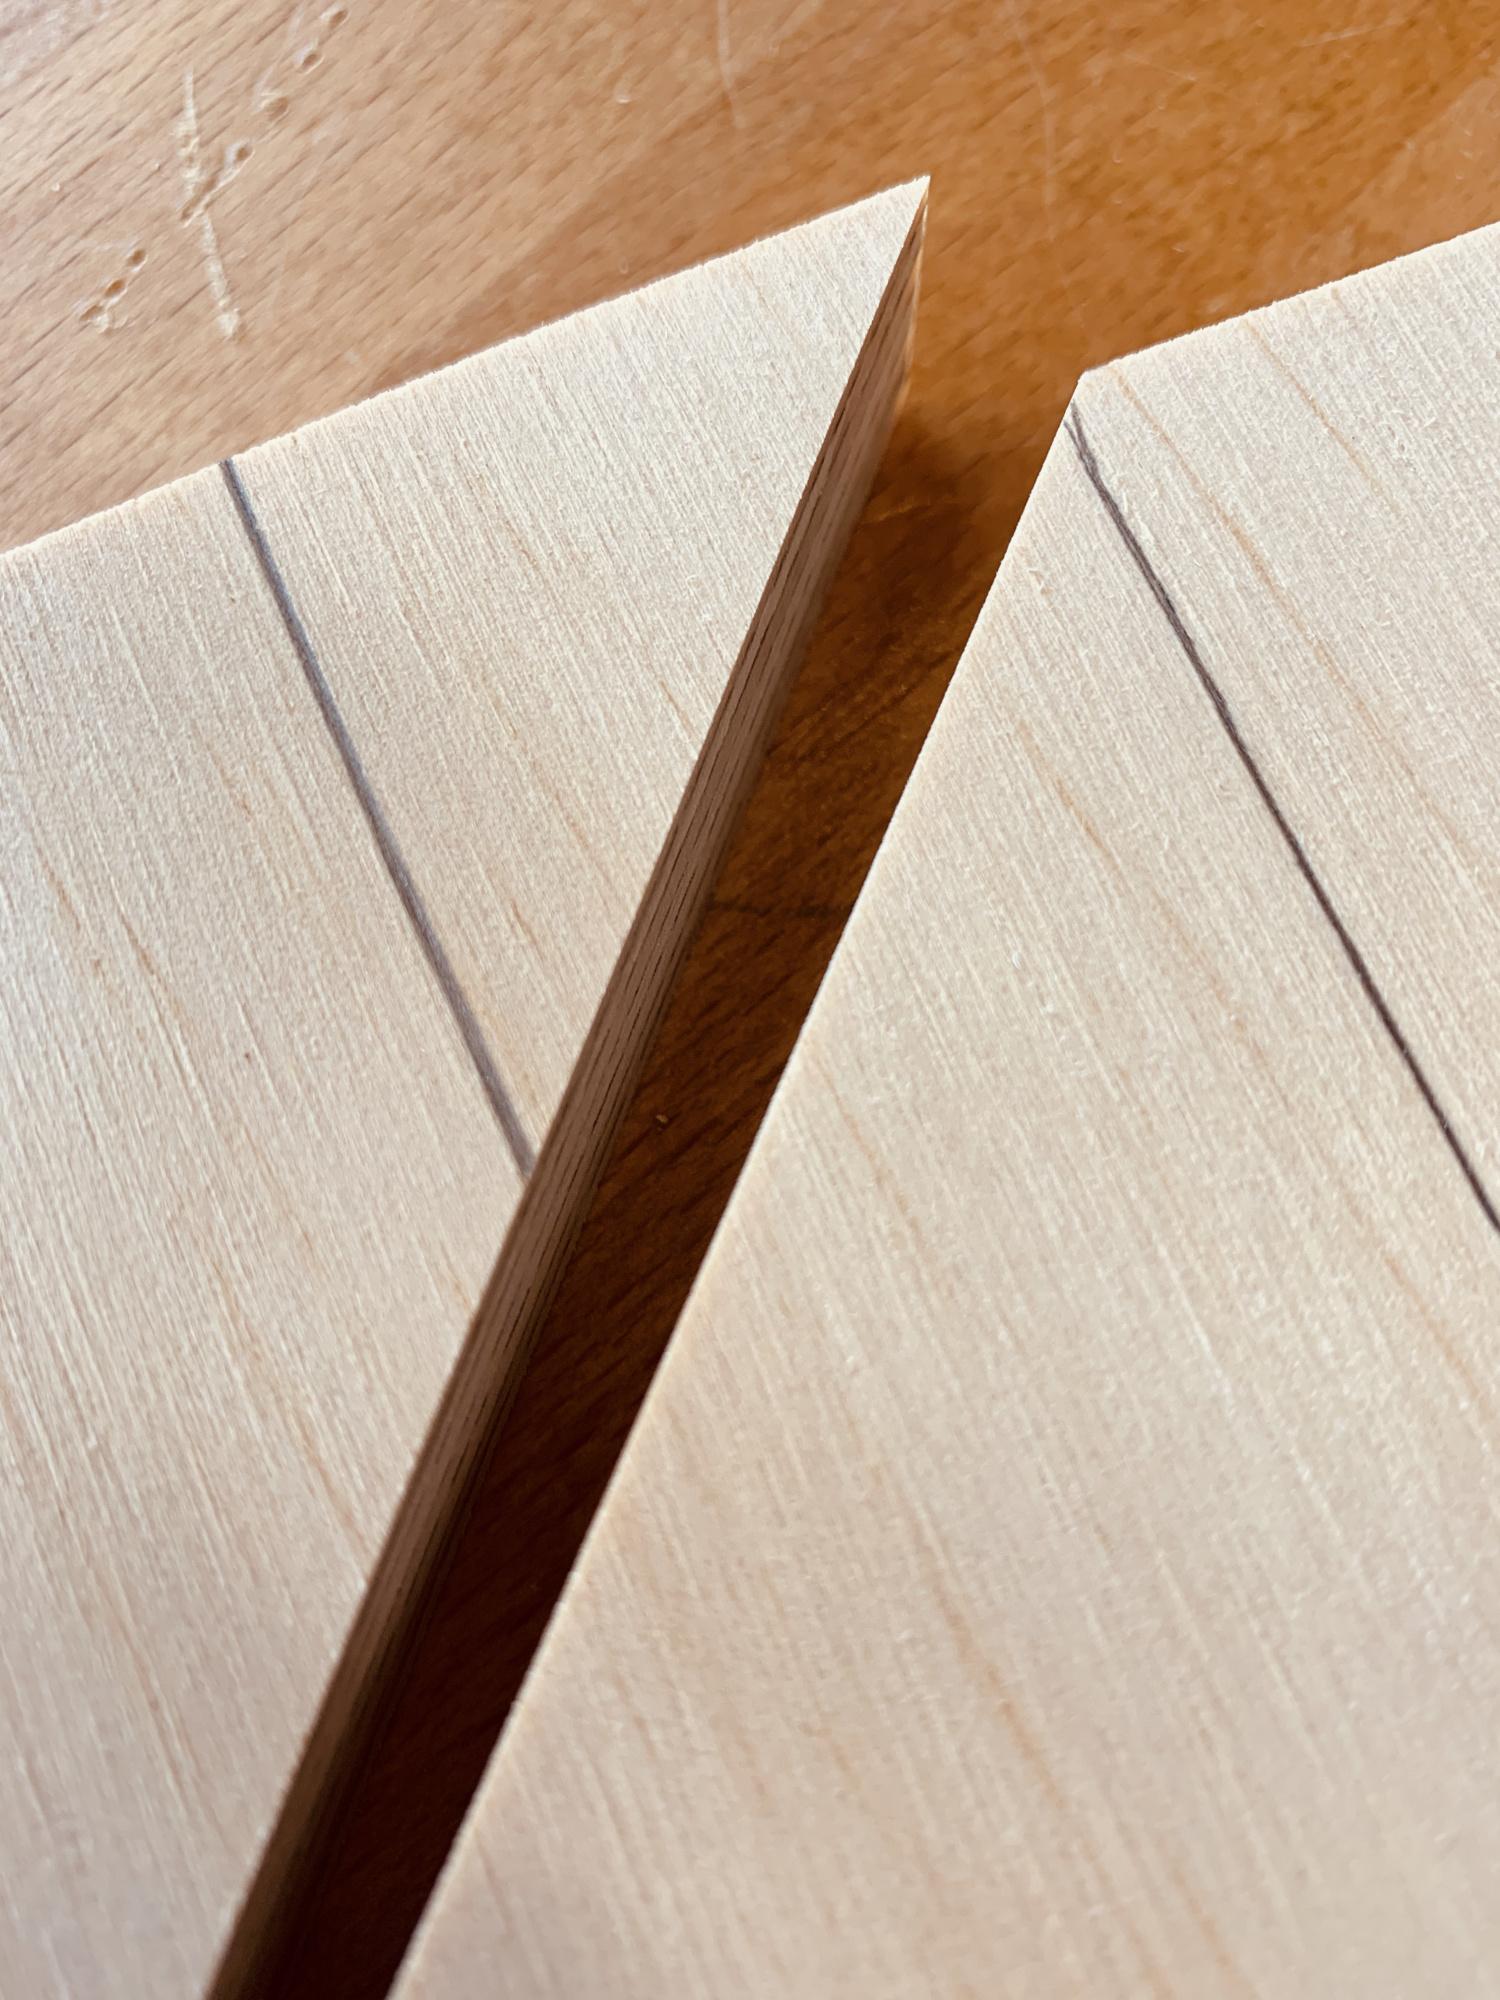 "new saw blade for me Freud 10"" x 40T-edges.jpg"